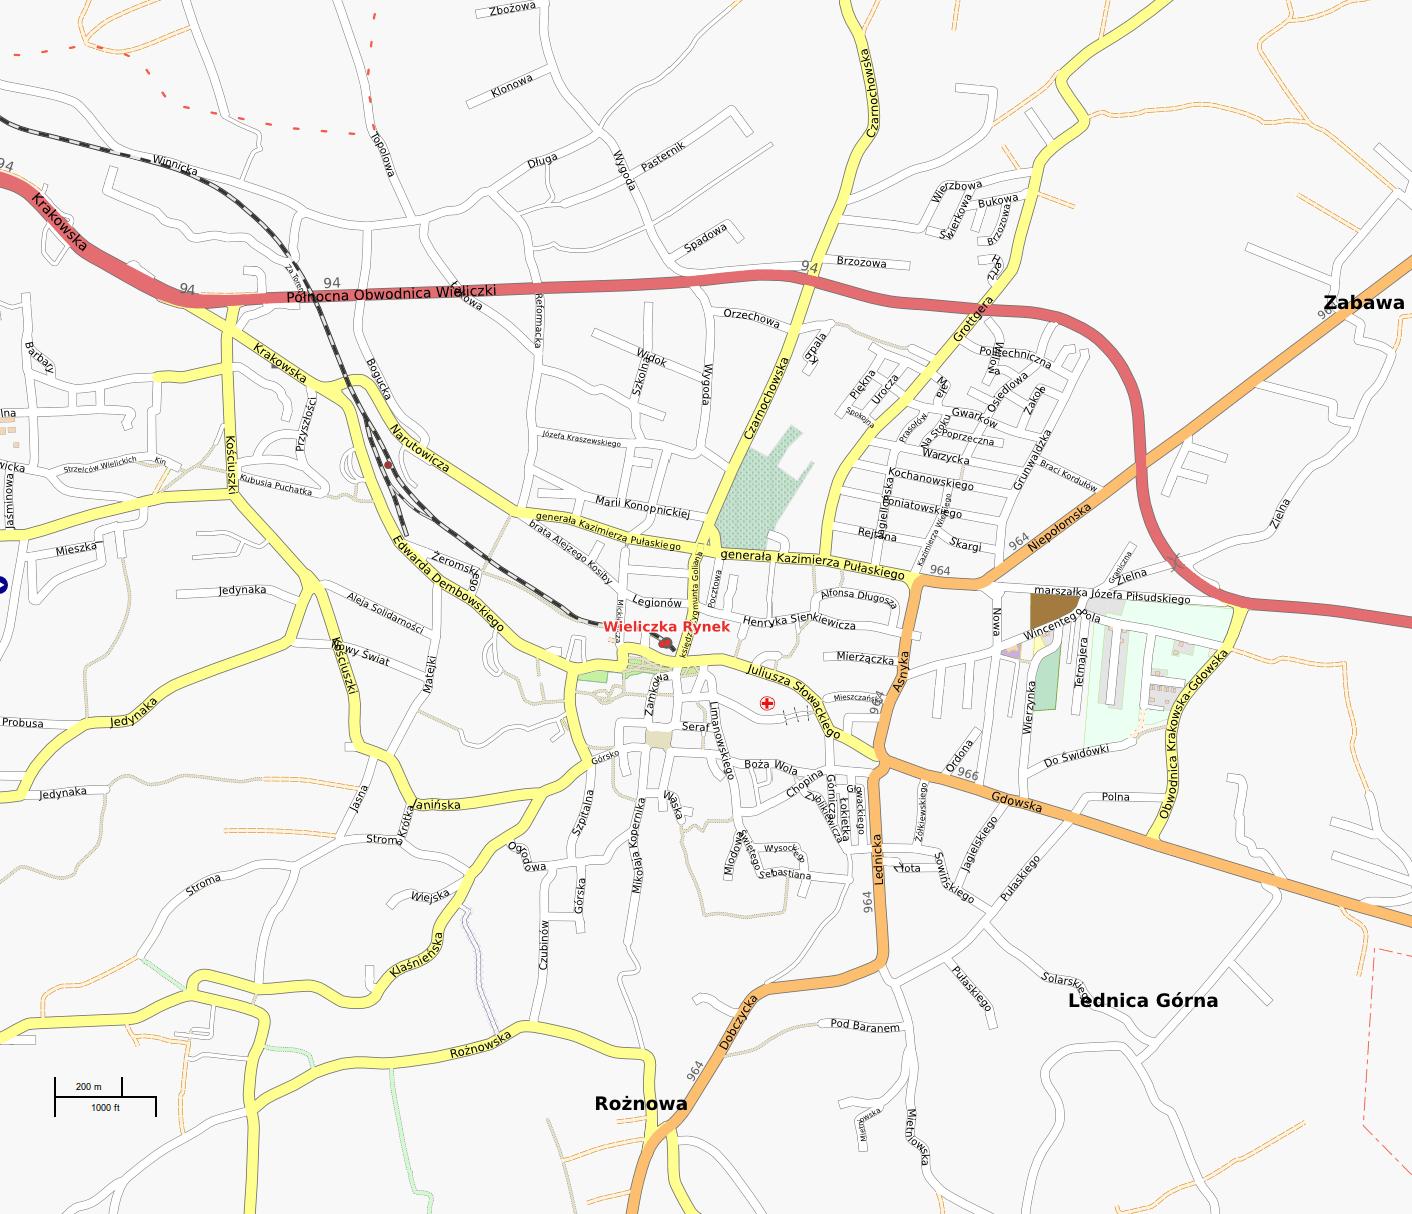 File:Wieliczka map.png - Wikimedia Commons